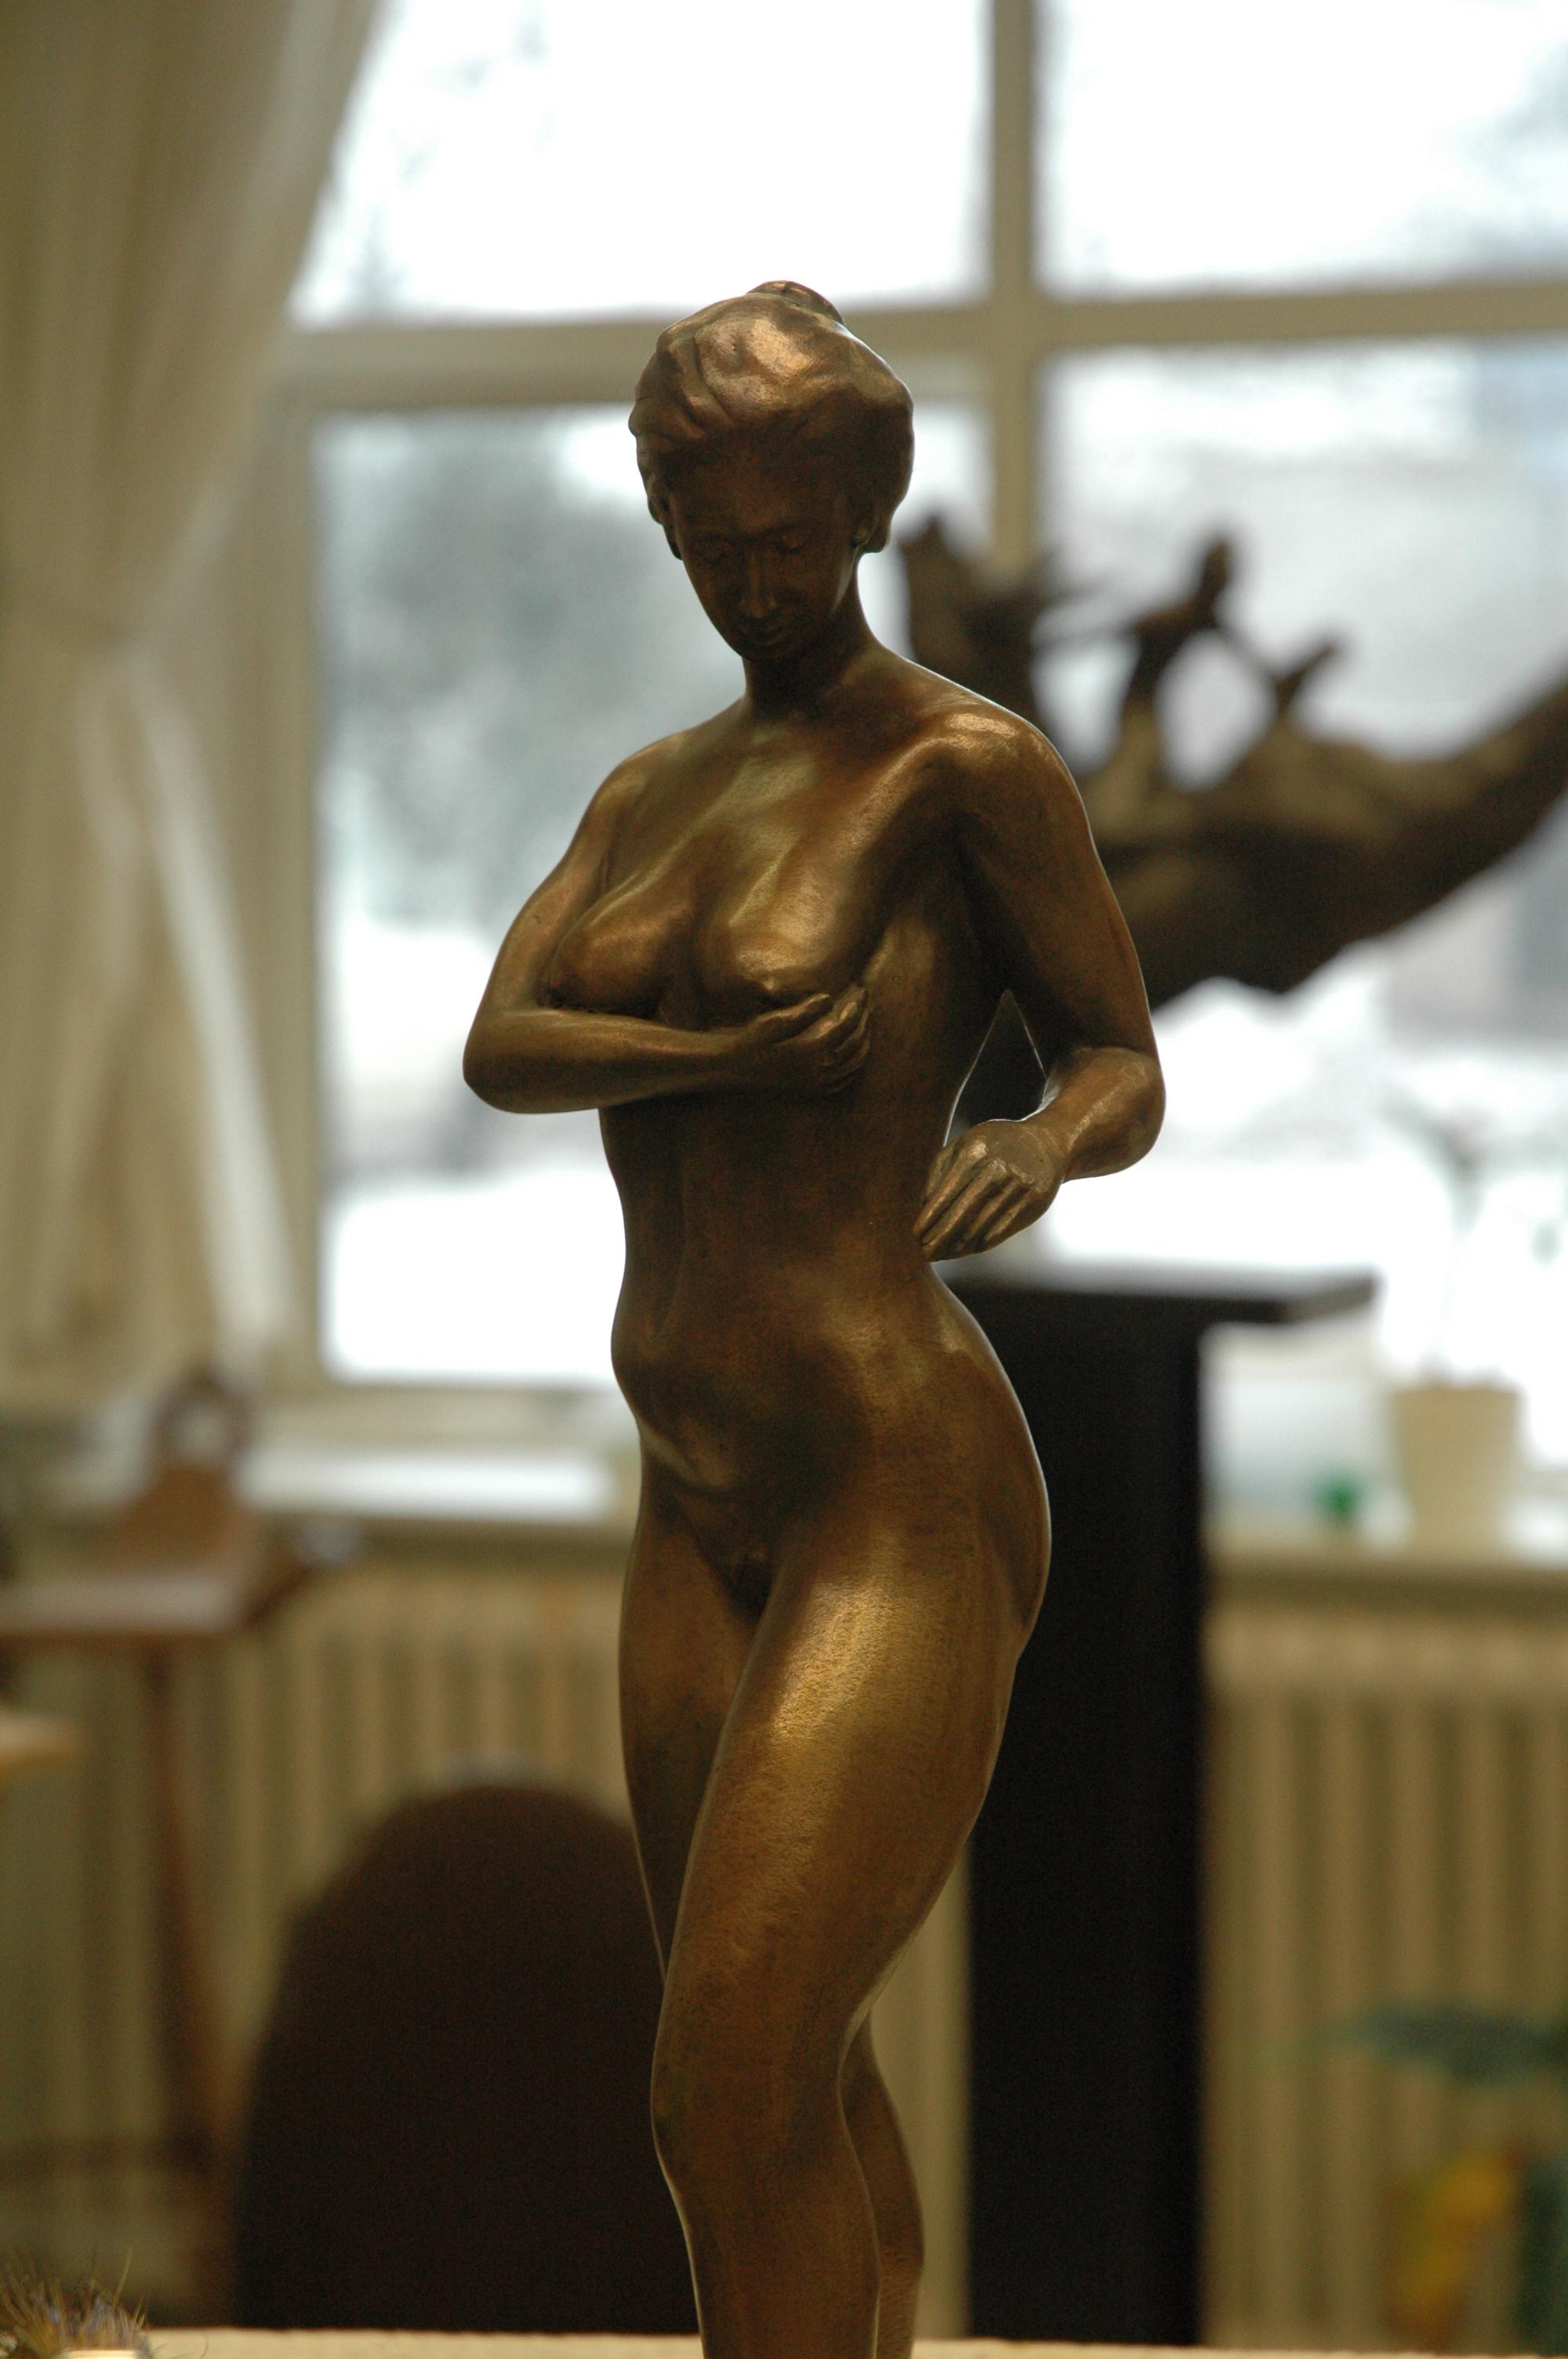 Femme (Woman)